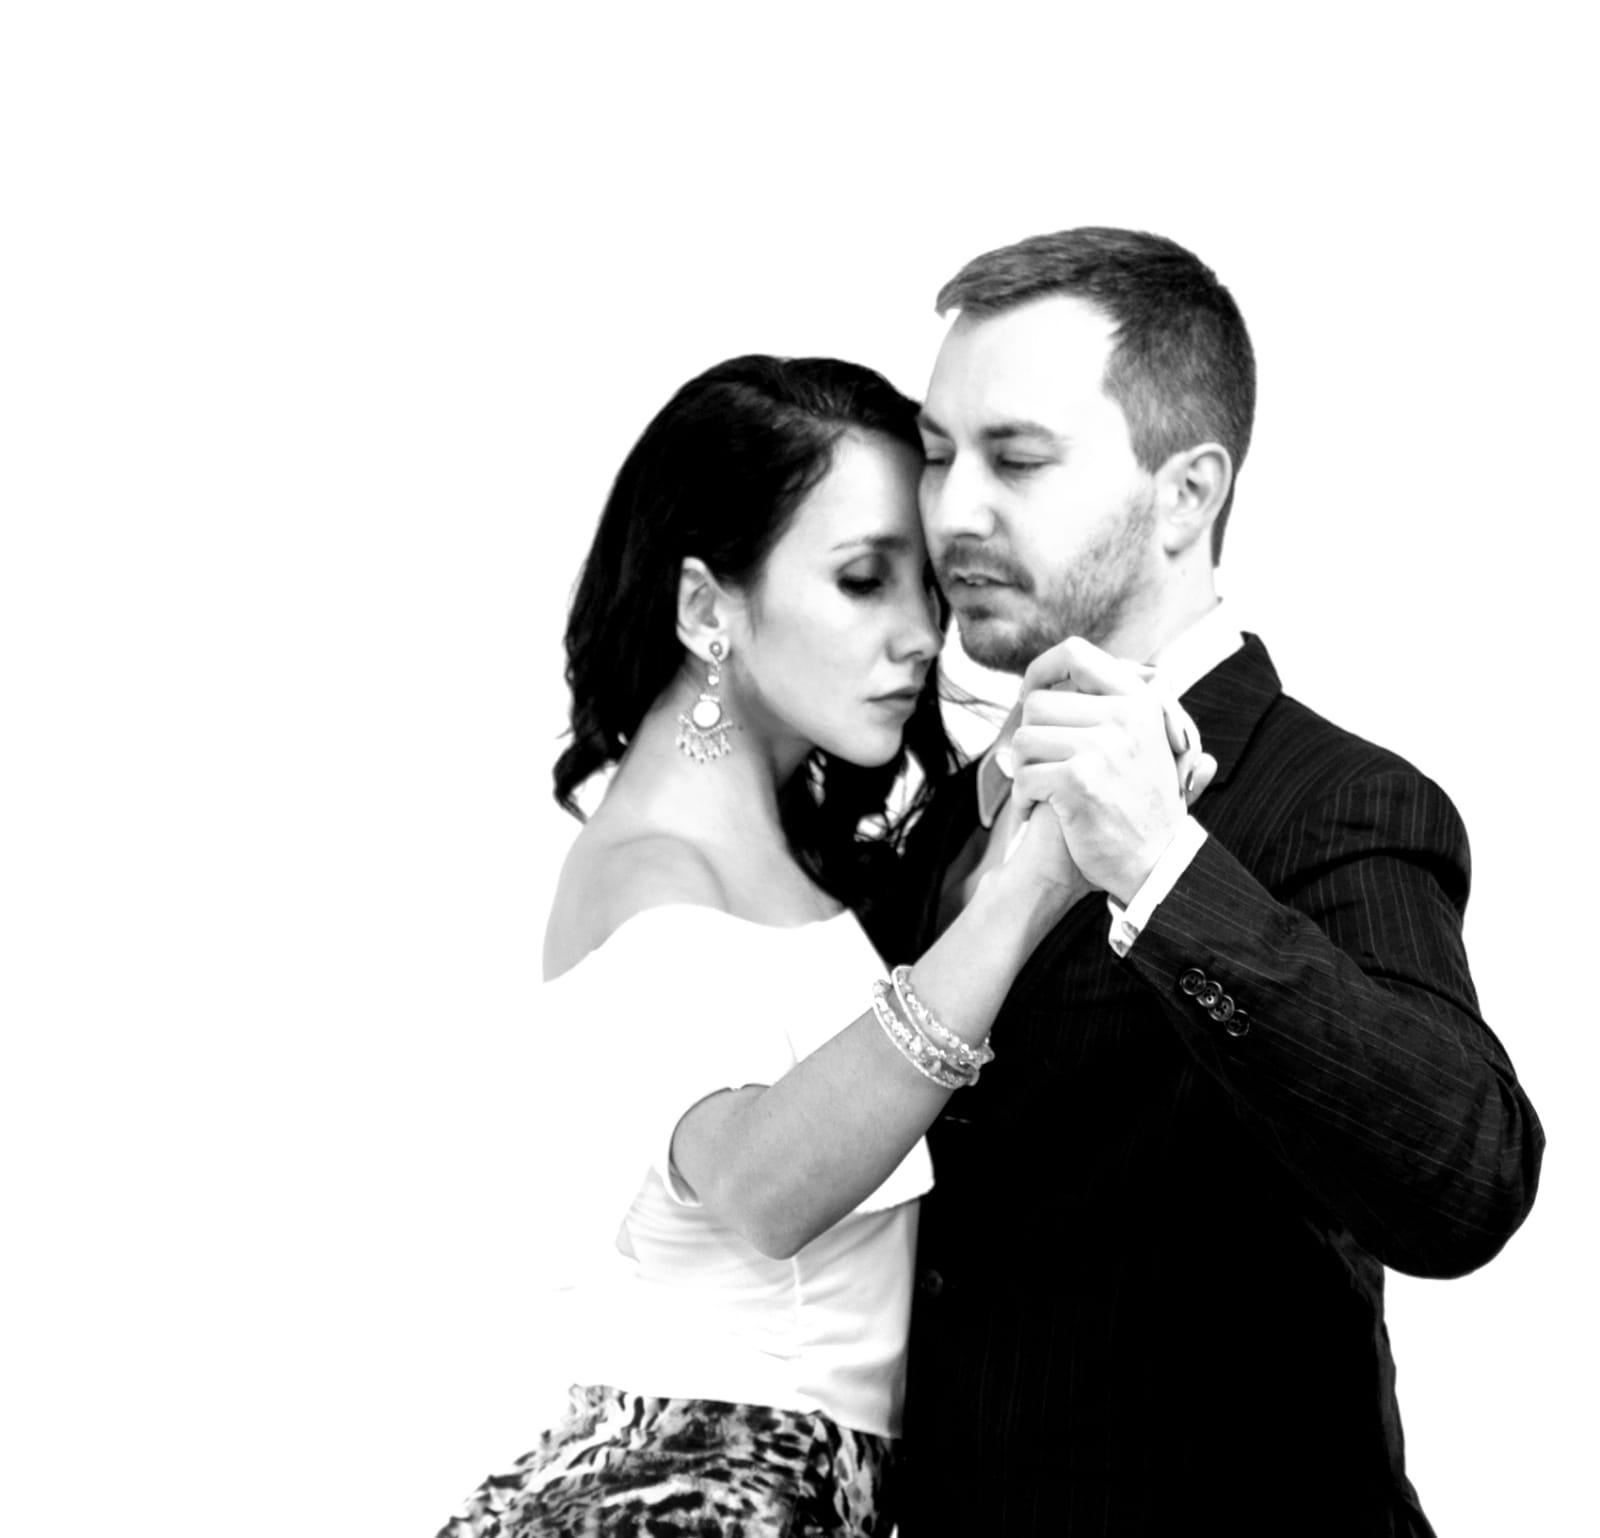 Adam Cornett and Jesica Arfenoni